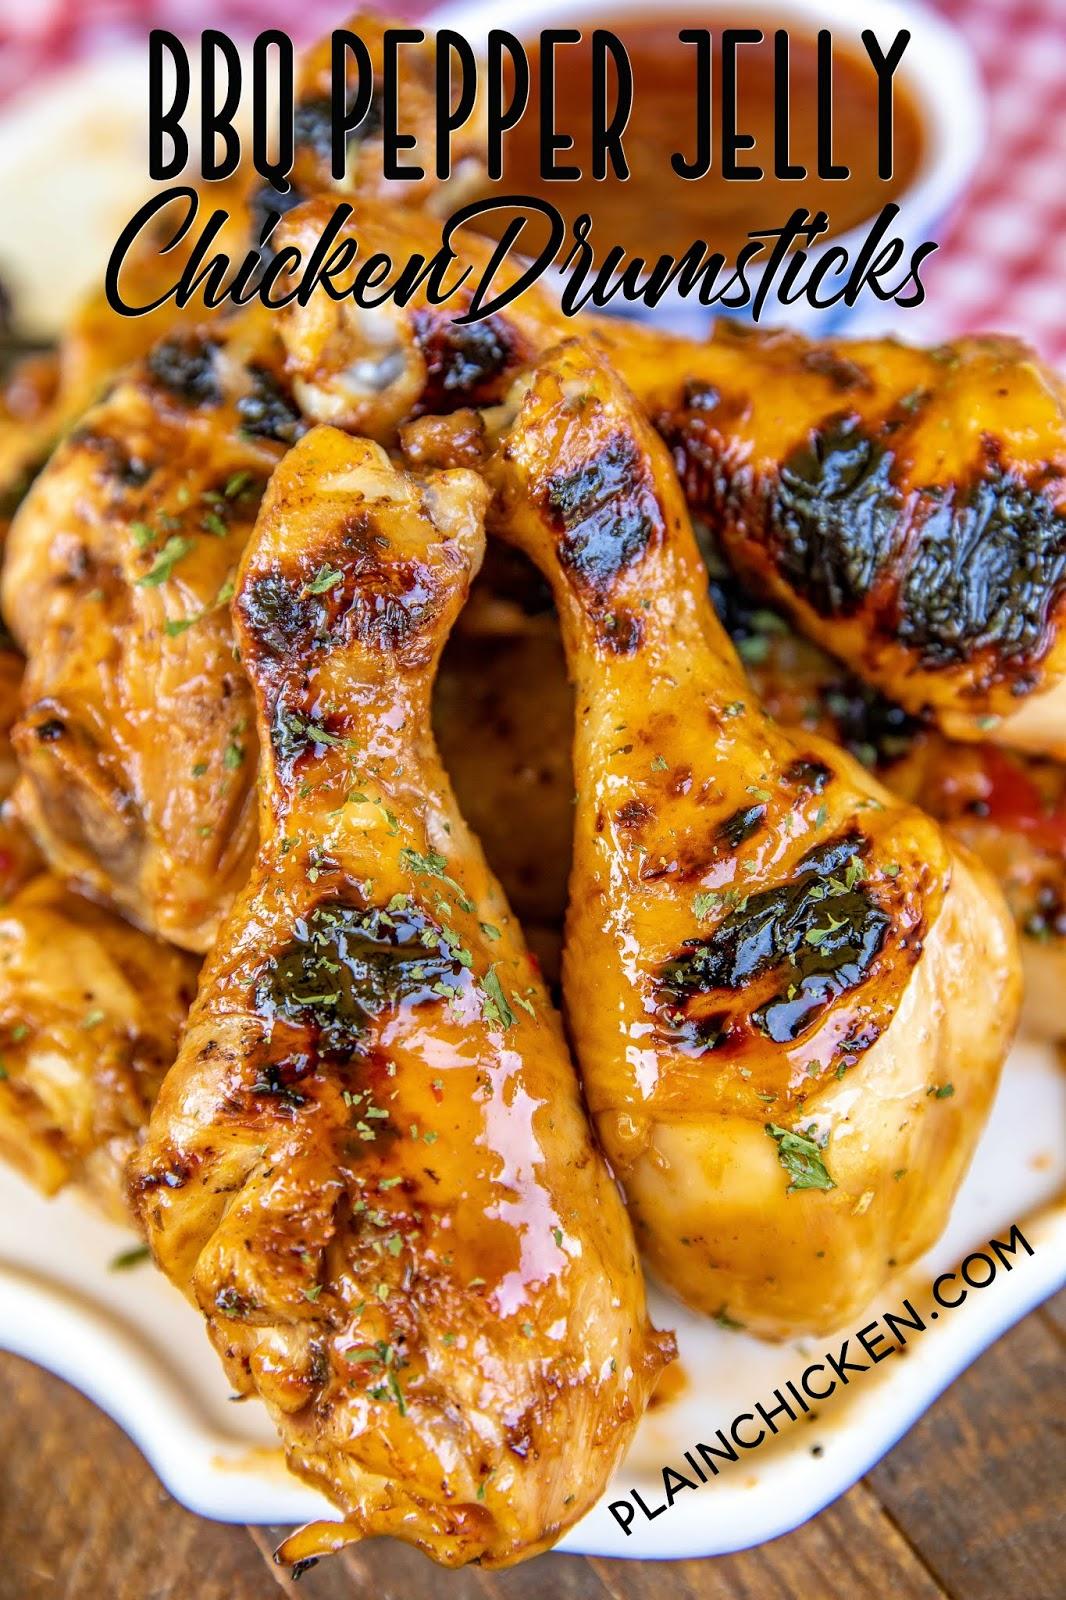 grilled chicken drumsticks on a platter